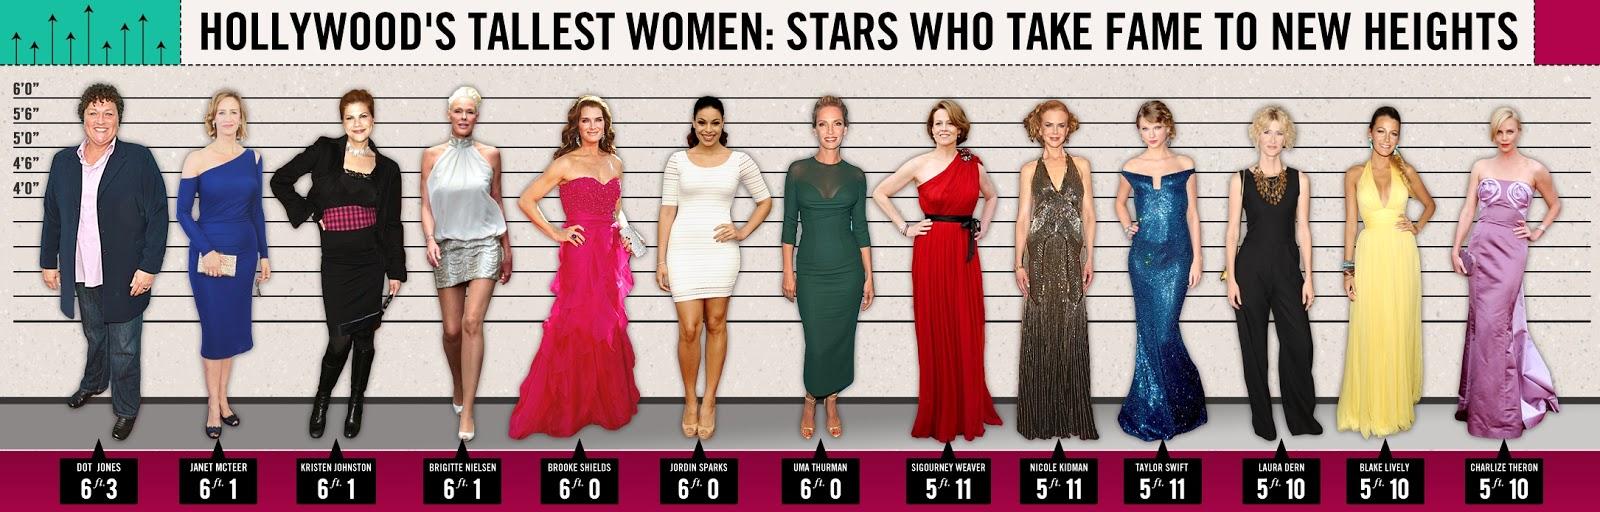 how tall is jordin sparks